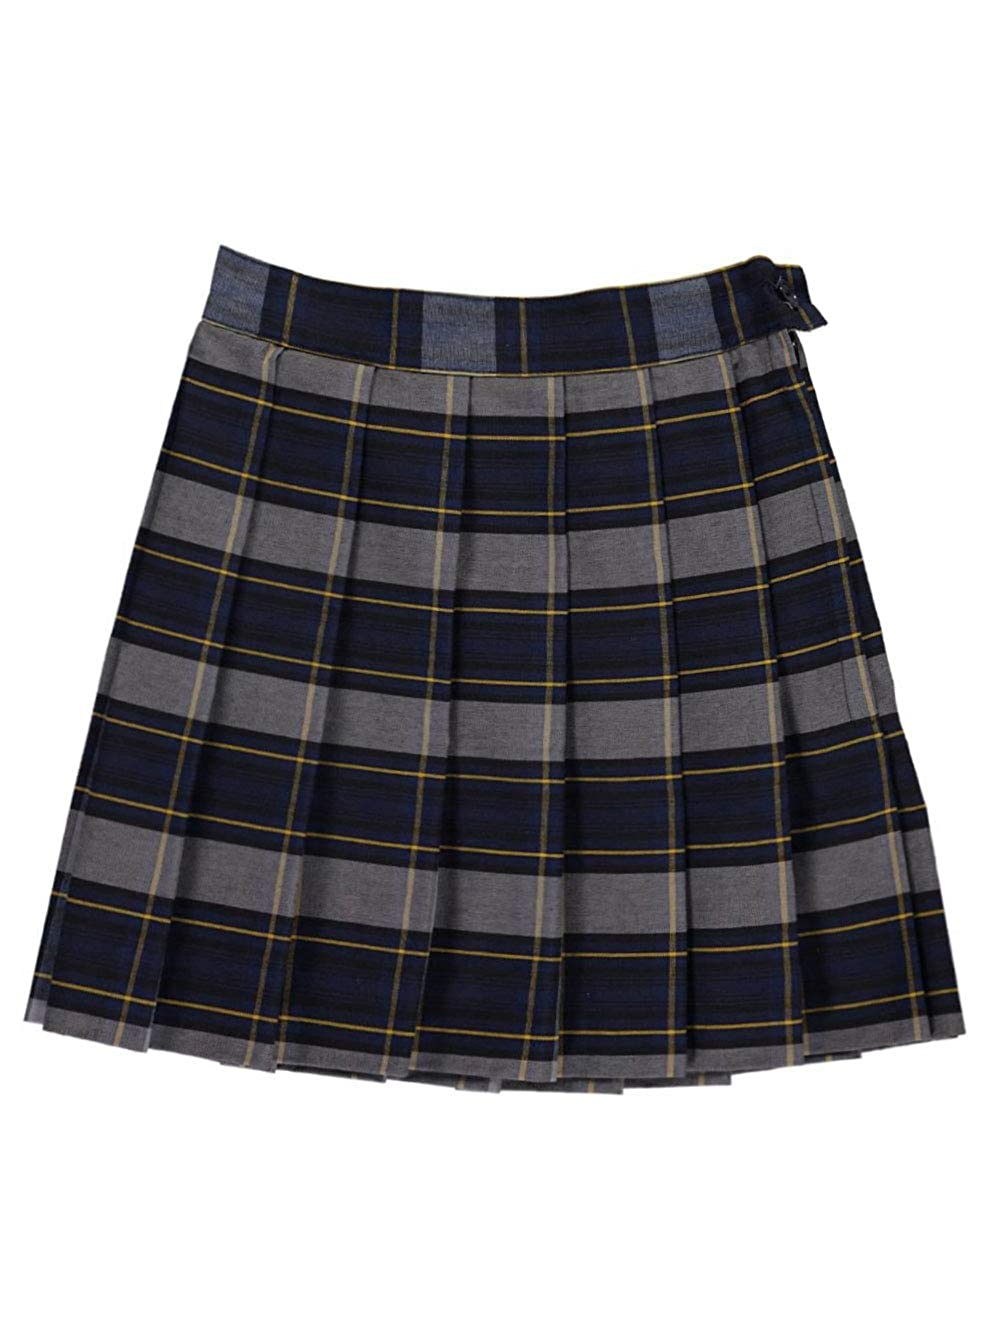 Cookies Brand Little GirlsRuby Pleated Skirt